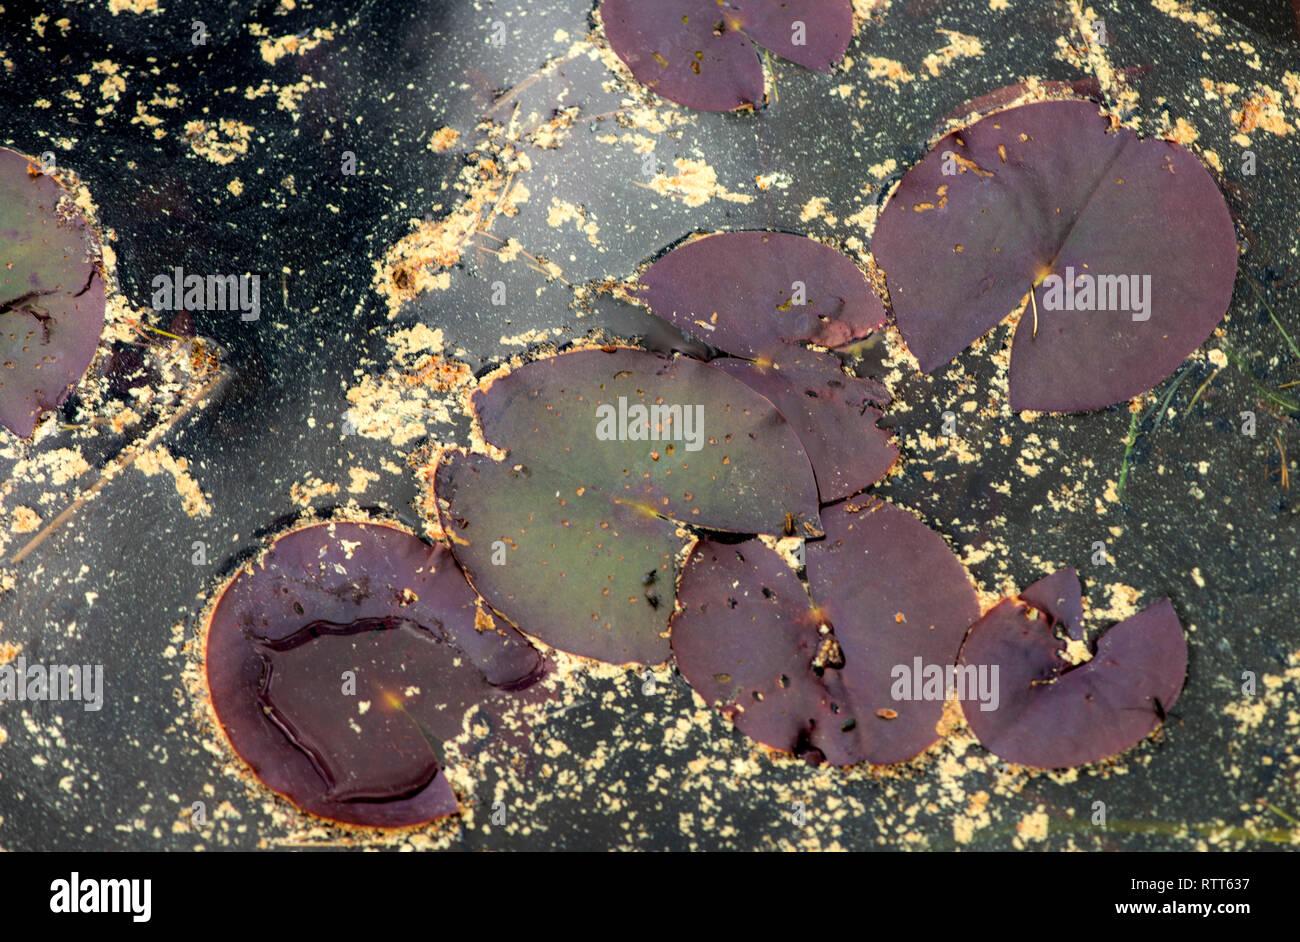 Plant, photosynthetic, eukaryotes, Plantae,  multicellular, flowering, plants, gymnosperms, ferns, Green plants, photosynthesis, chloroplasts, - Stock Image